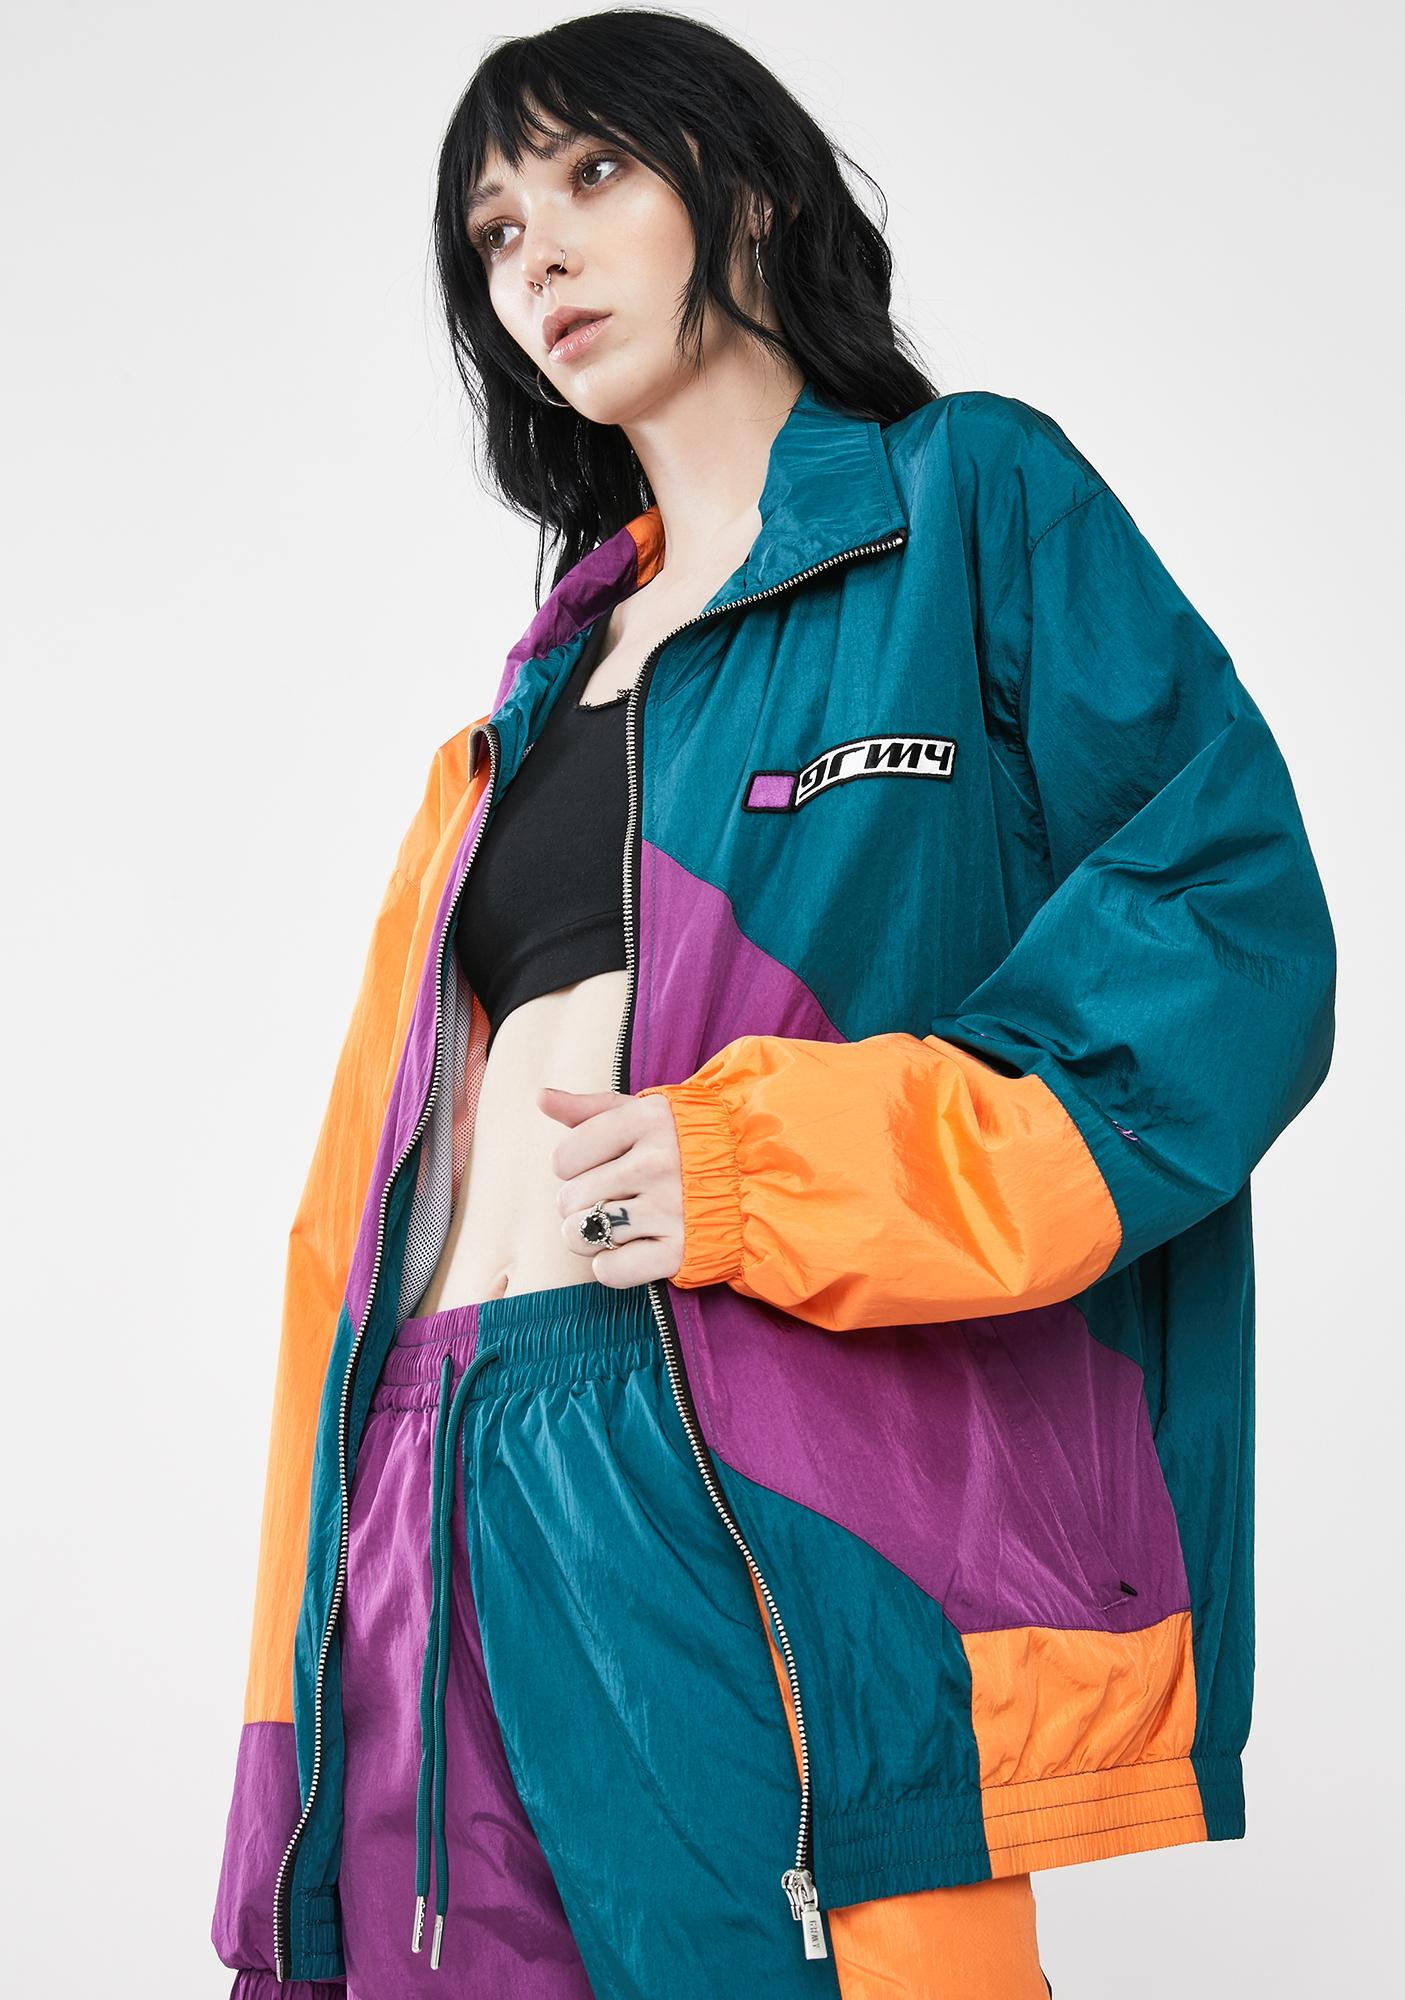 GRIMEY Acknowledge Color Block Track Jacket